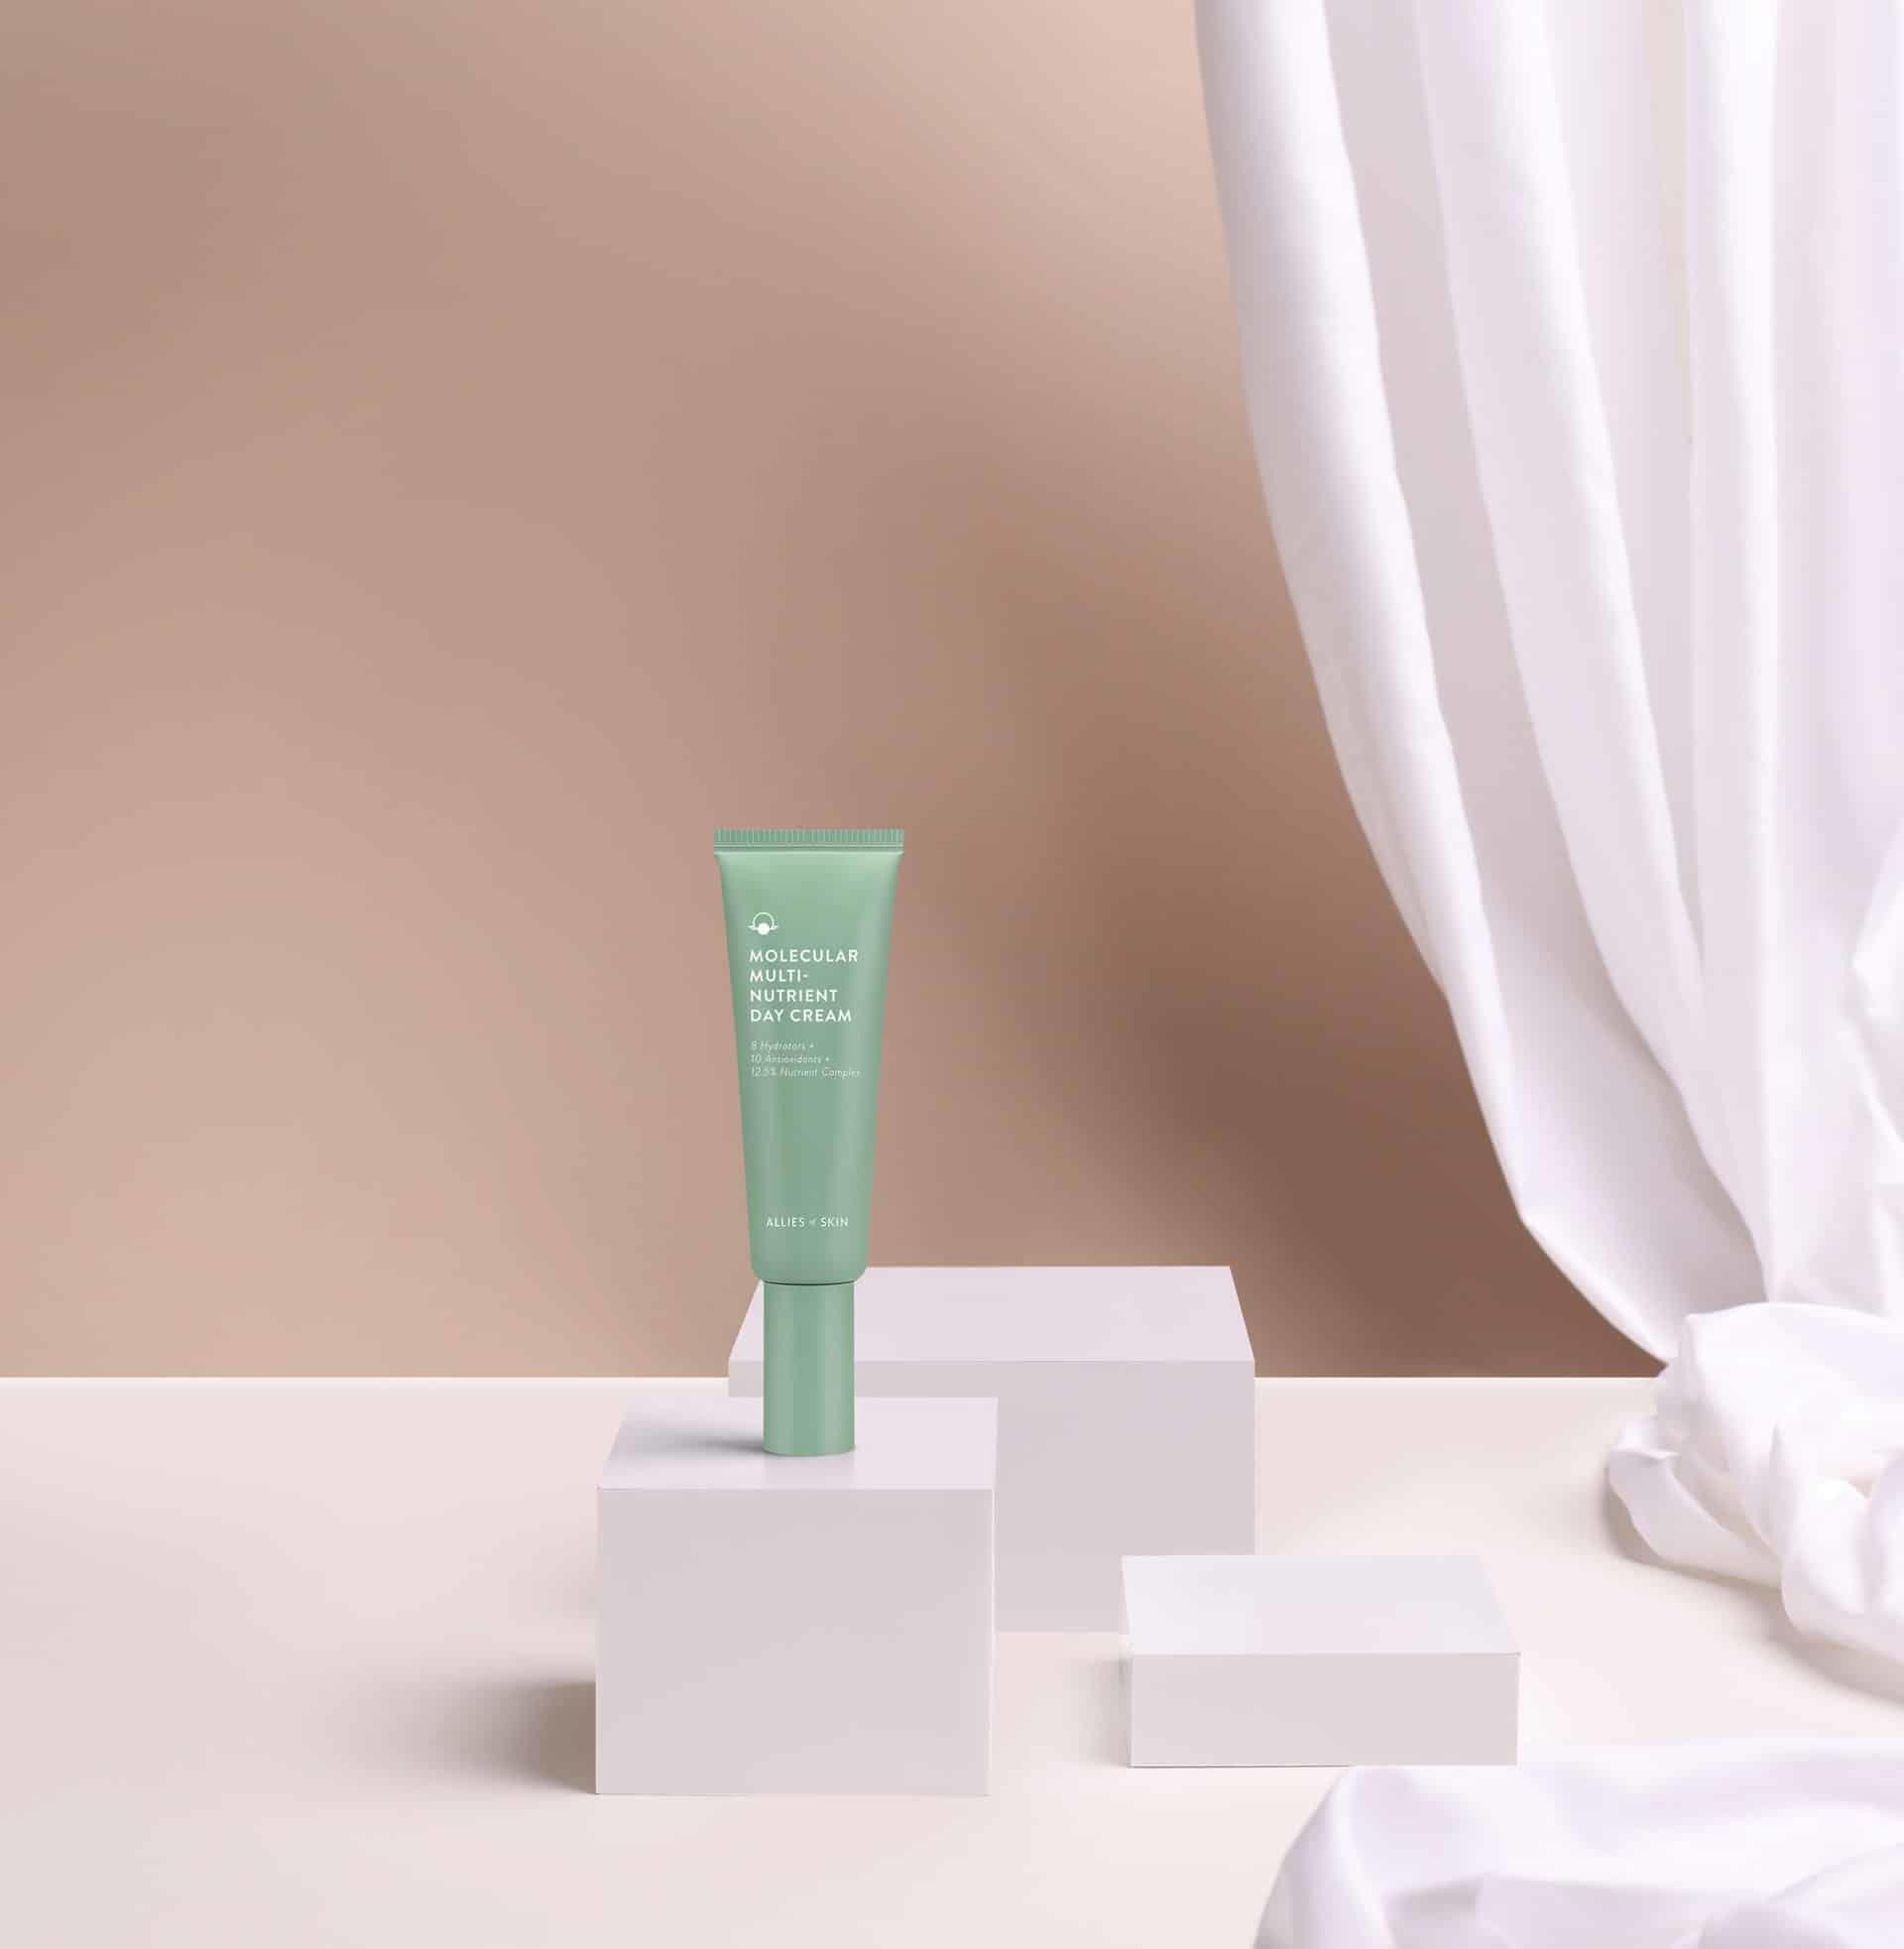 Крем для лица Allies of Skin Molecular Multi-Nutrient Day Cream 50 ml